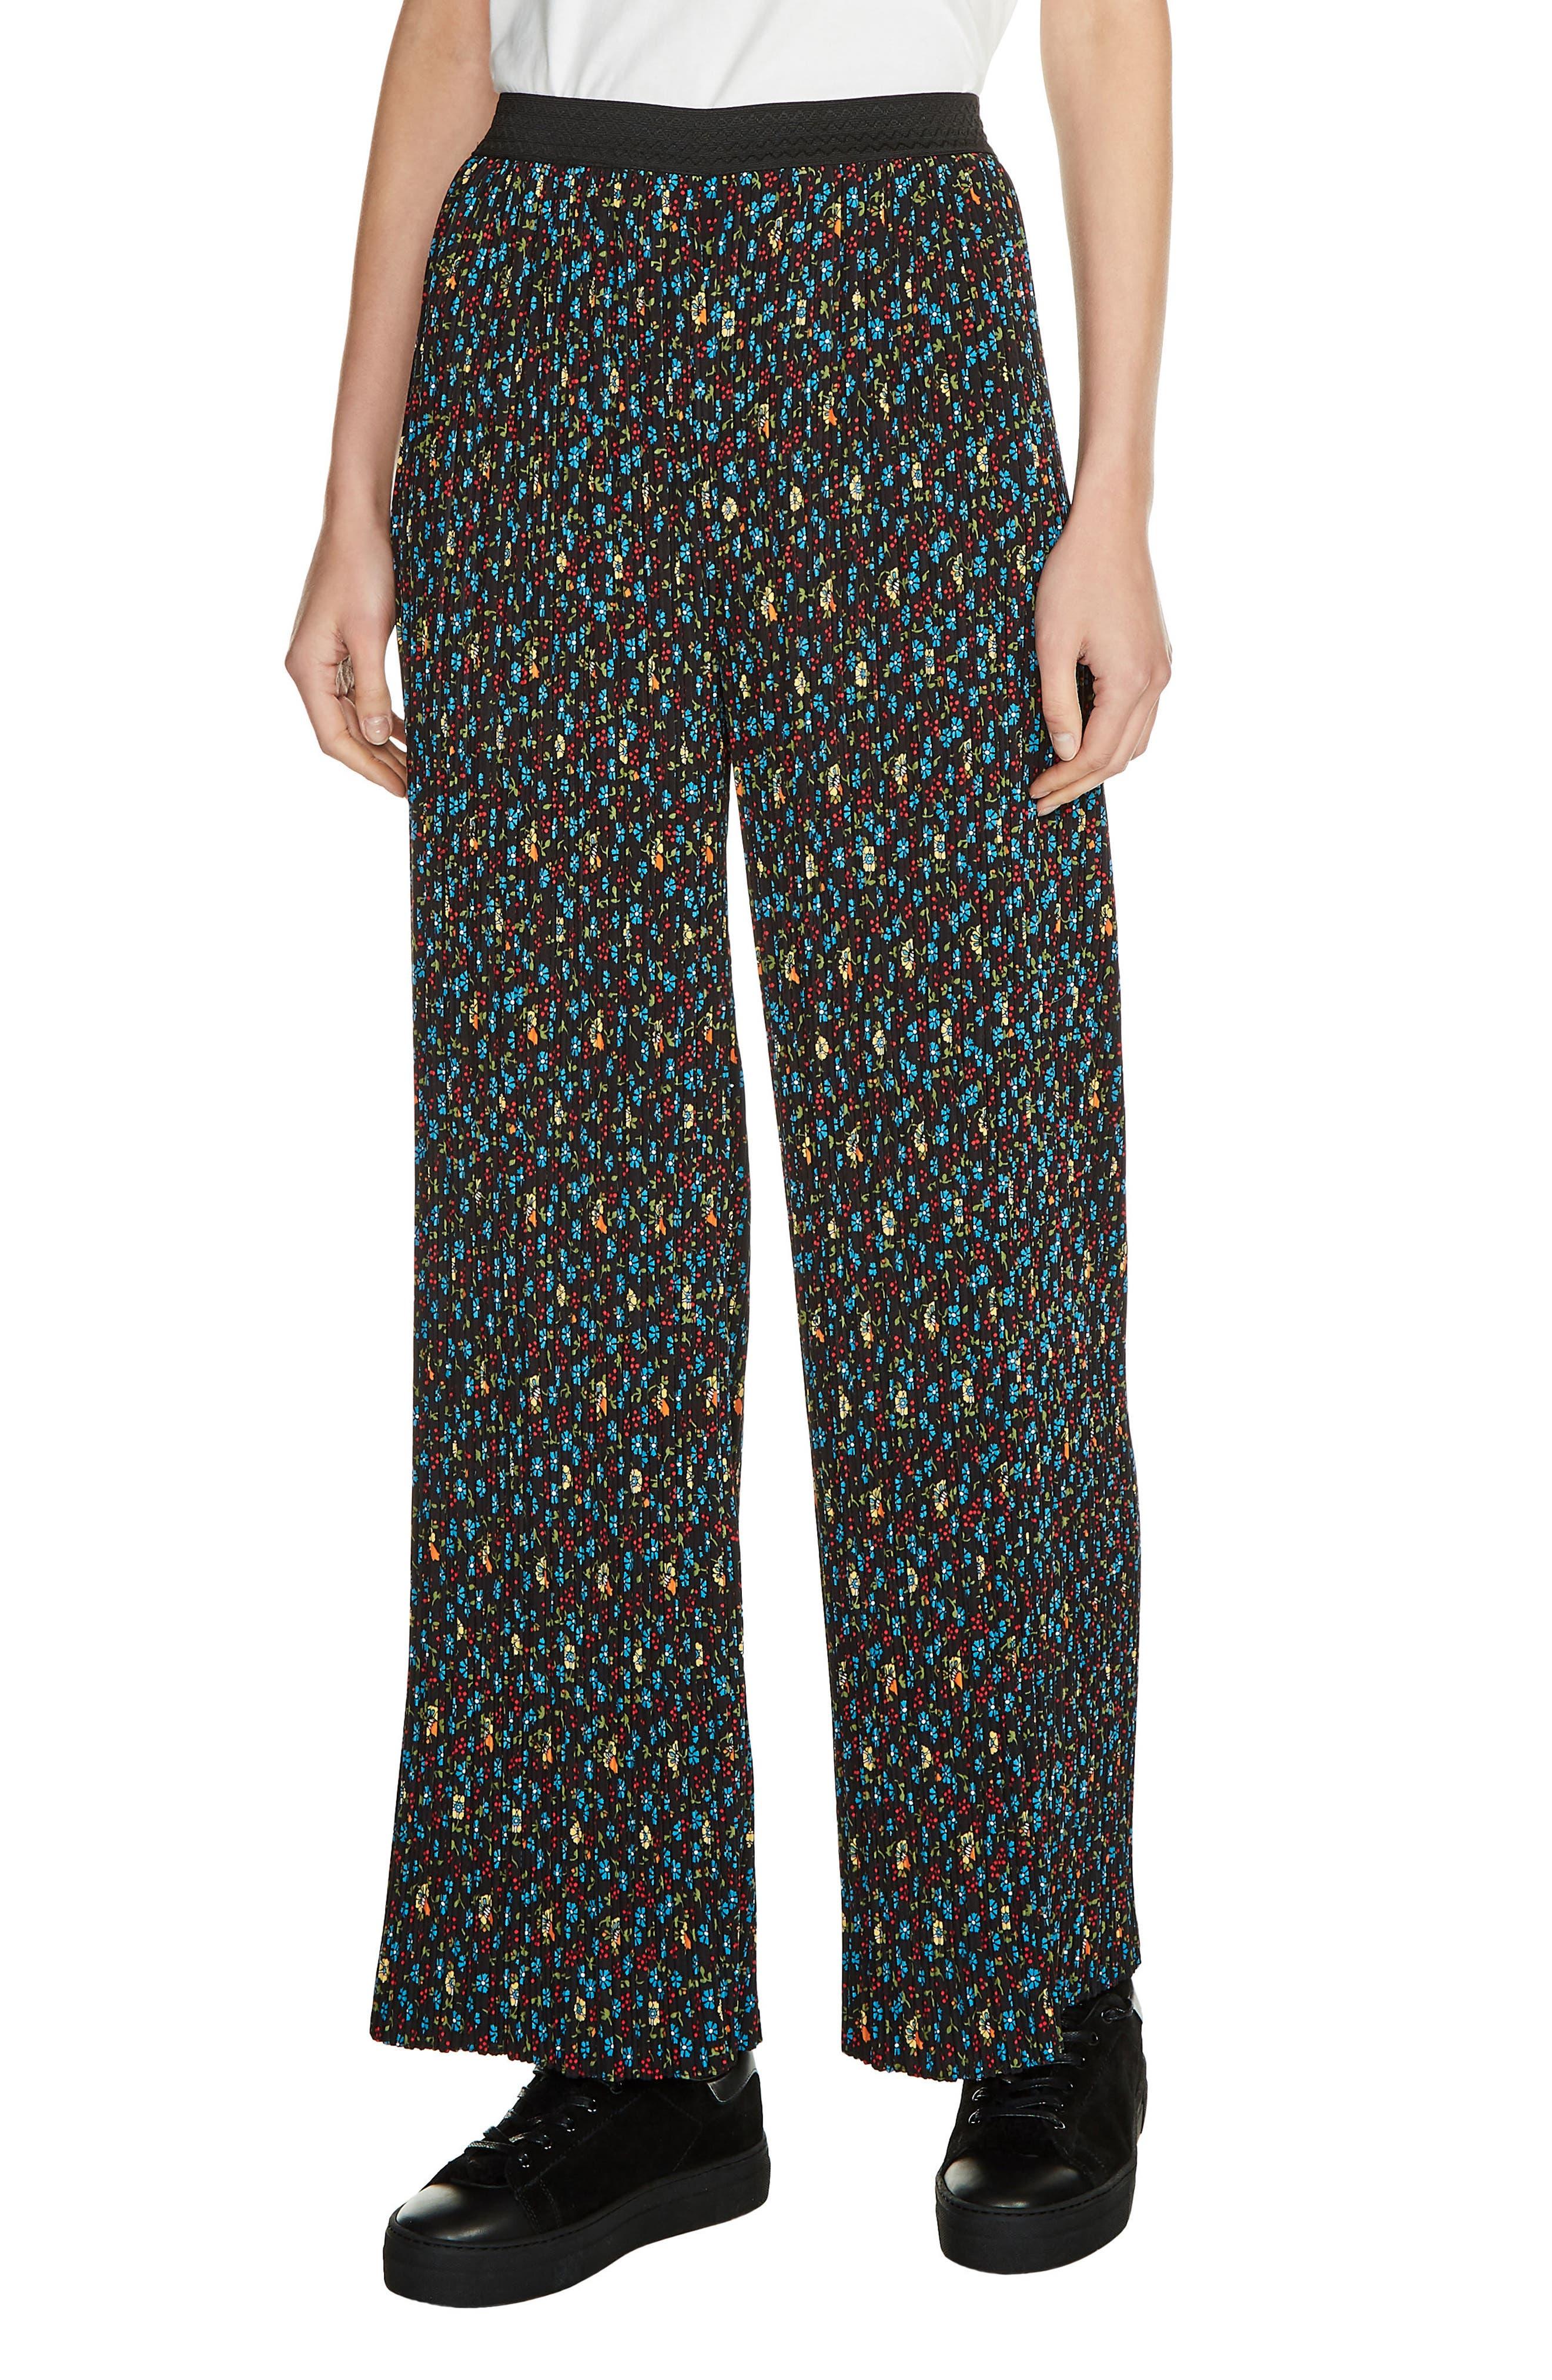 maje Floral Print Pleat Pants